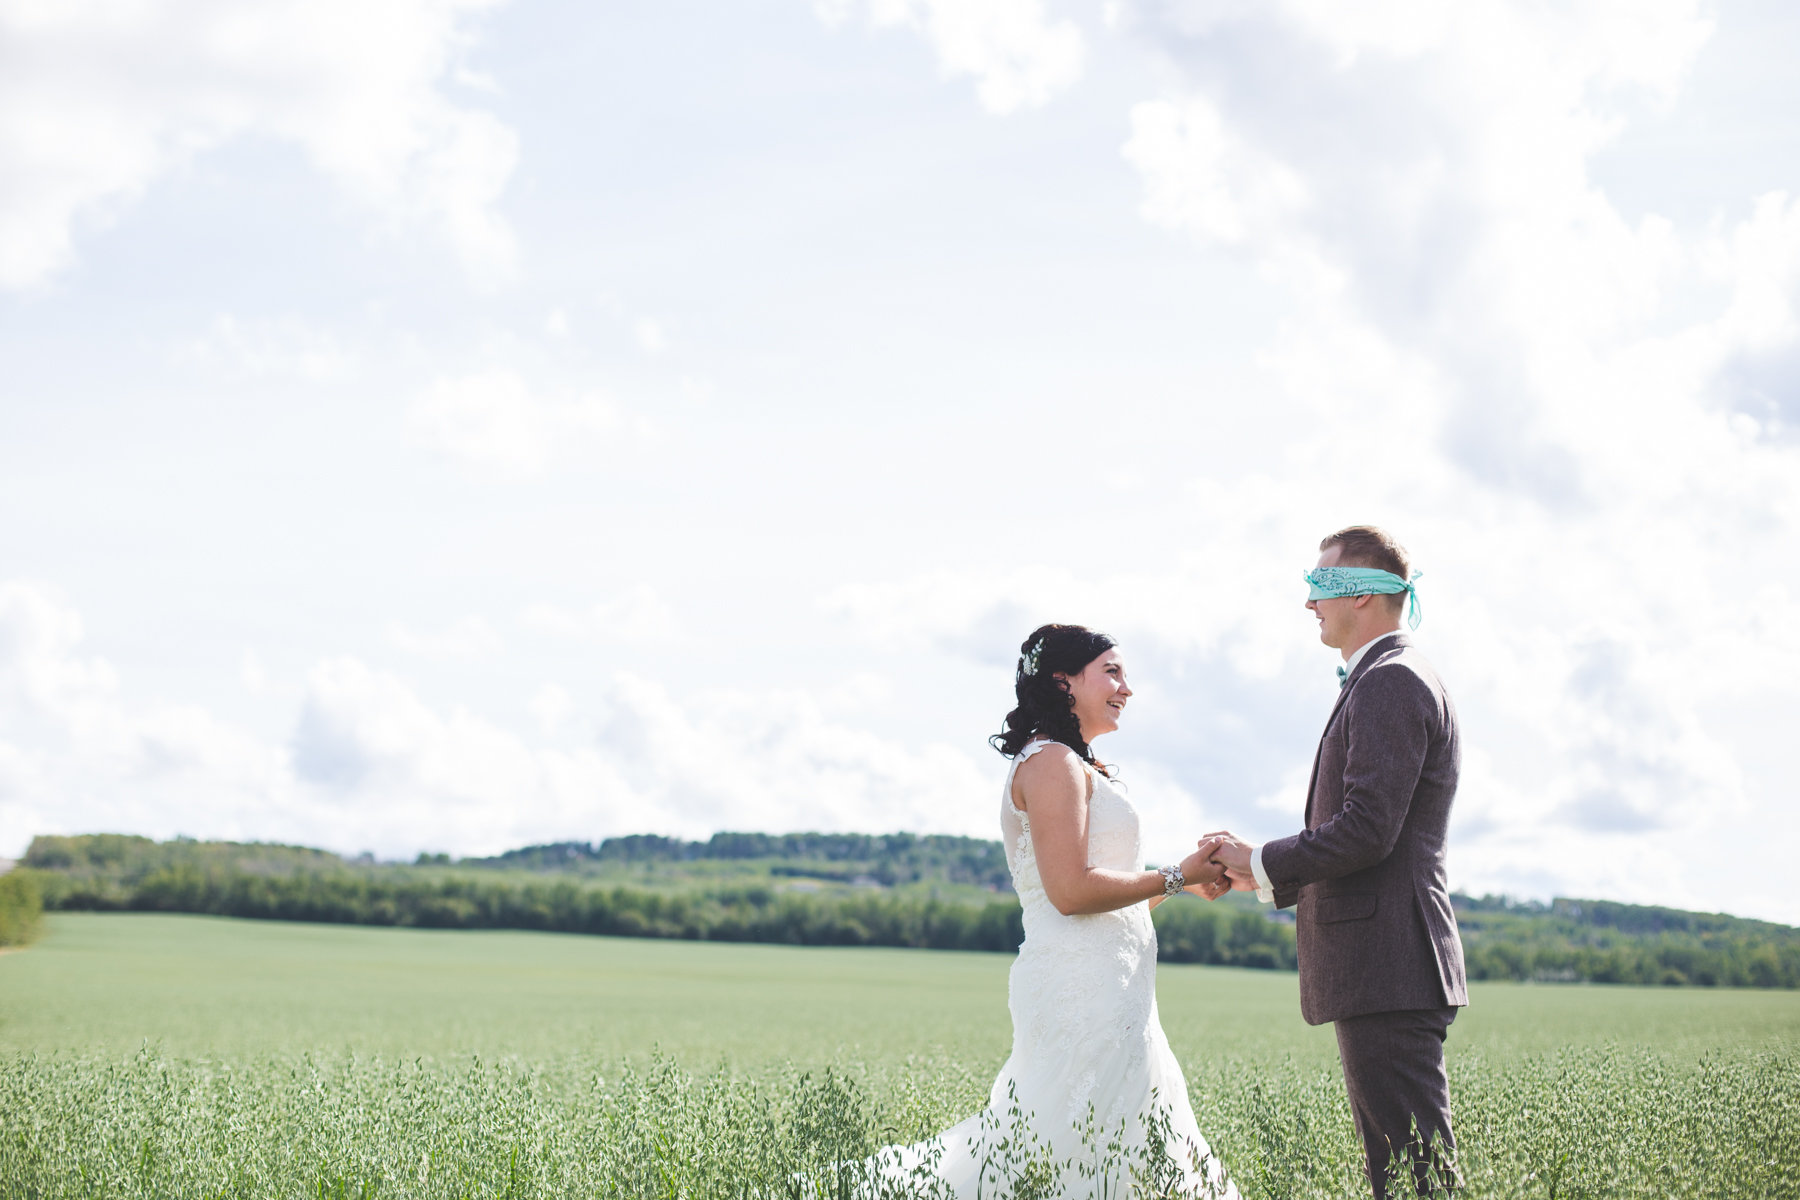 20150808-oglovewedding-1200.jpg